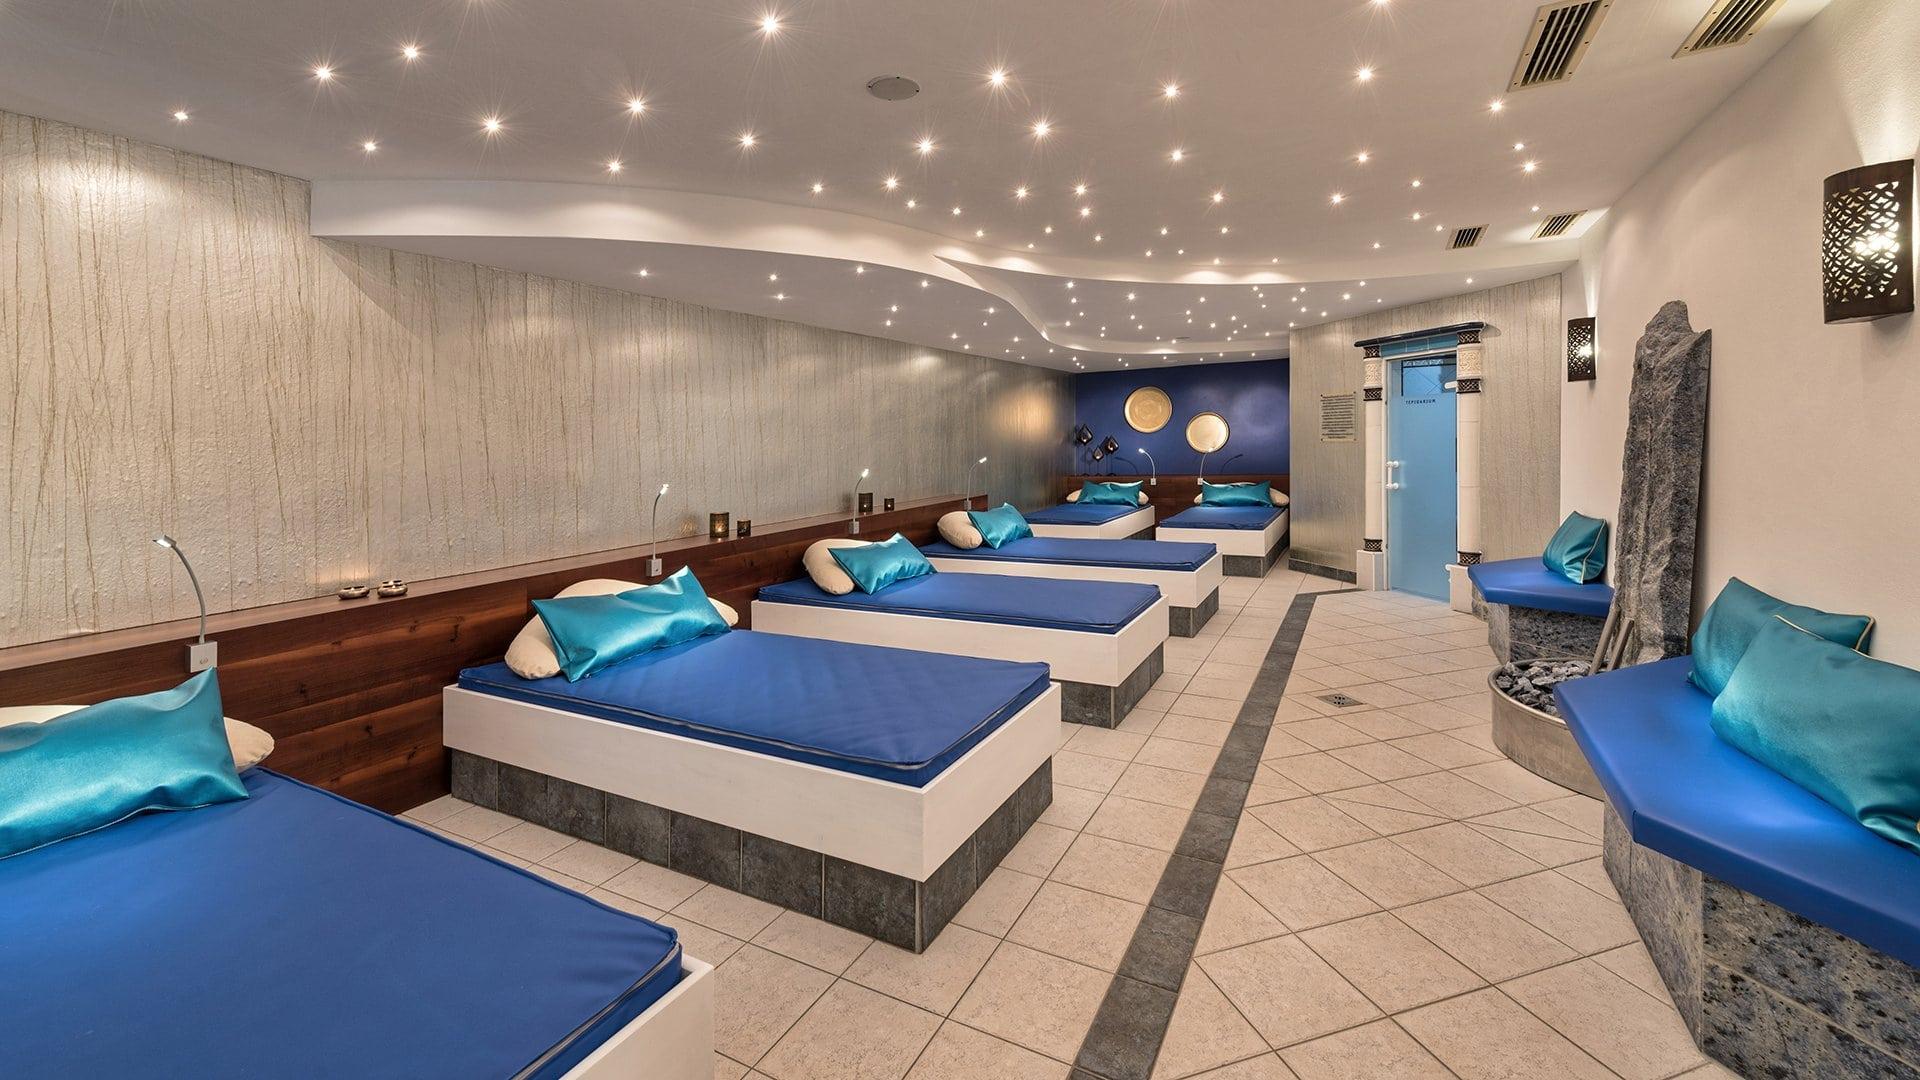 Spa & Vital › Sauna & Relax › Hotel Andy Jerzens